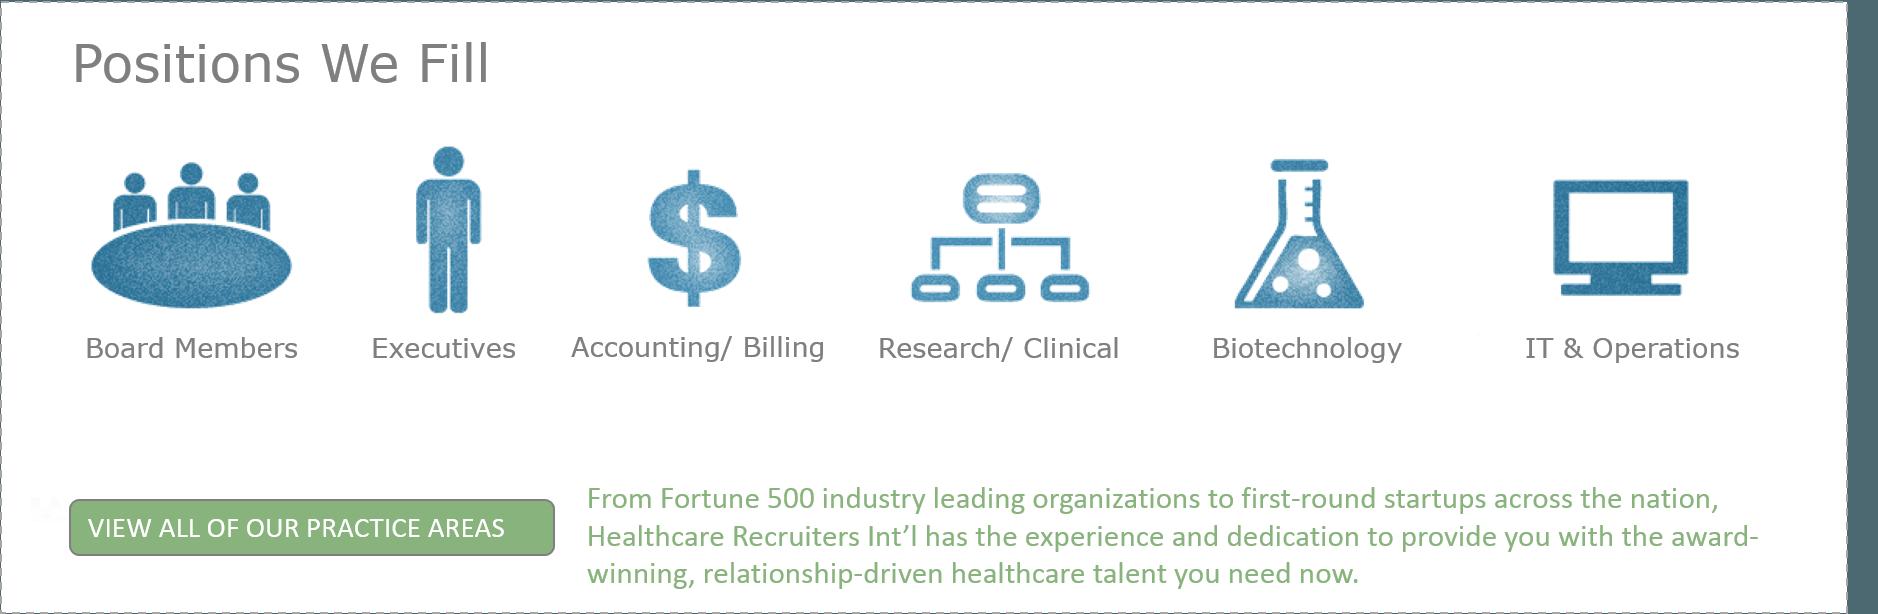 healthcare recruiters international